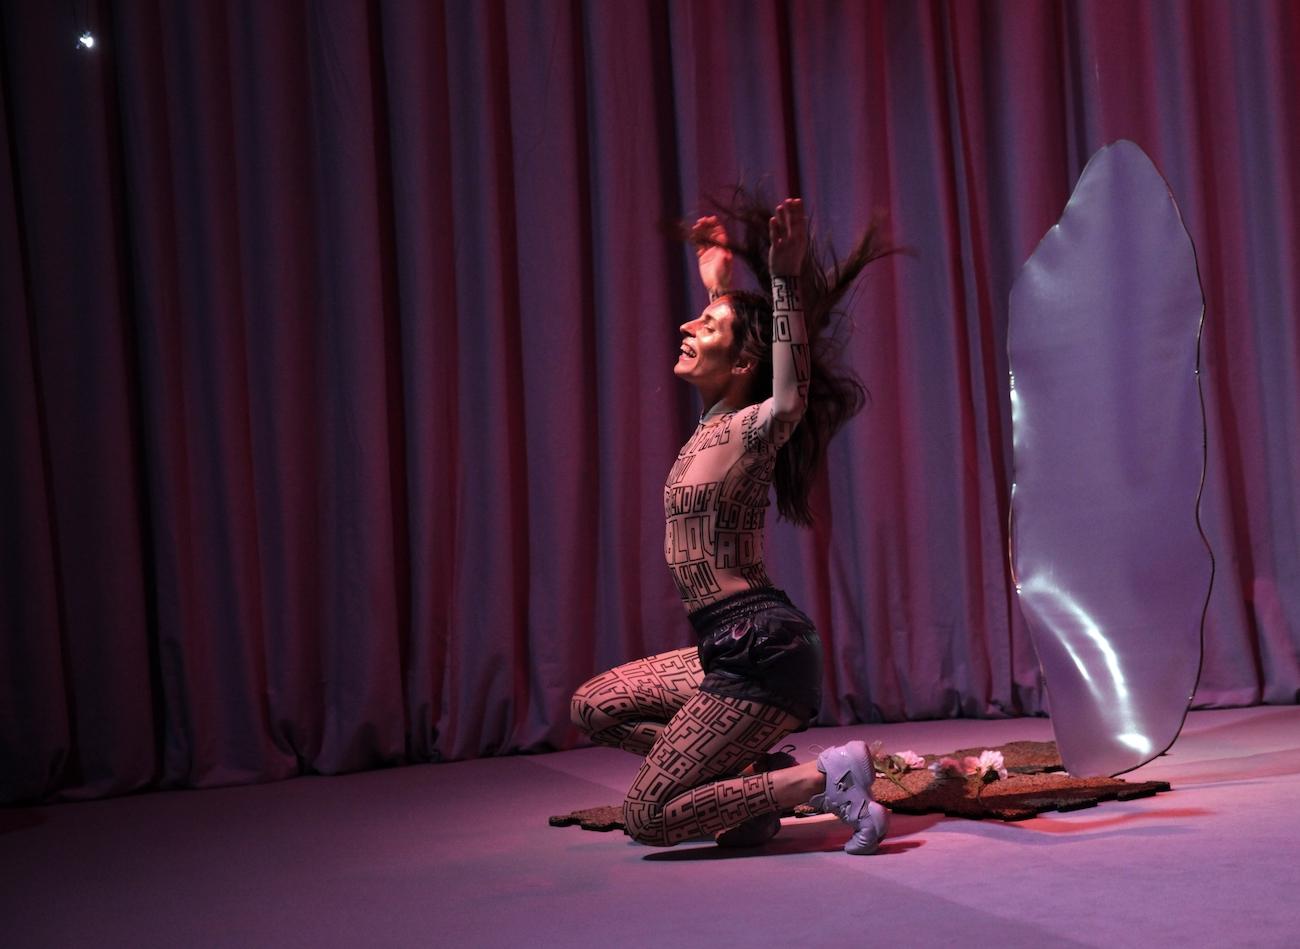 Kat Valastur, Stellar Fauna, Tan, Choreografie, Performance, Musik, Kunst, 030, 030magazin, Hebbel am Ufer,